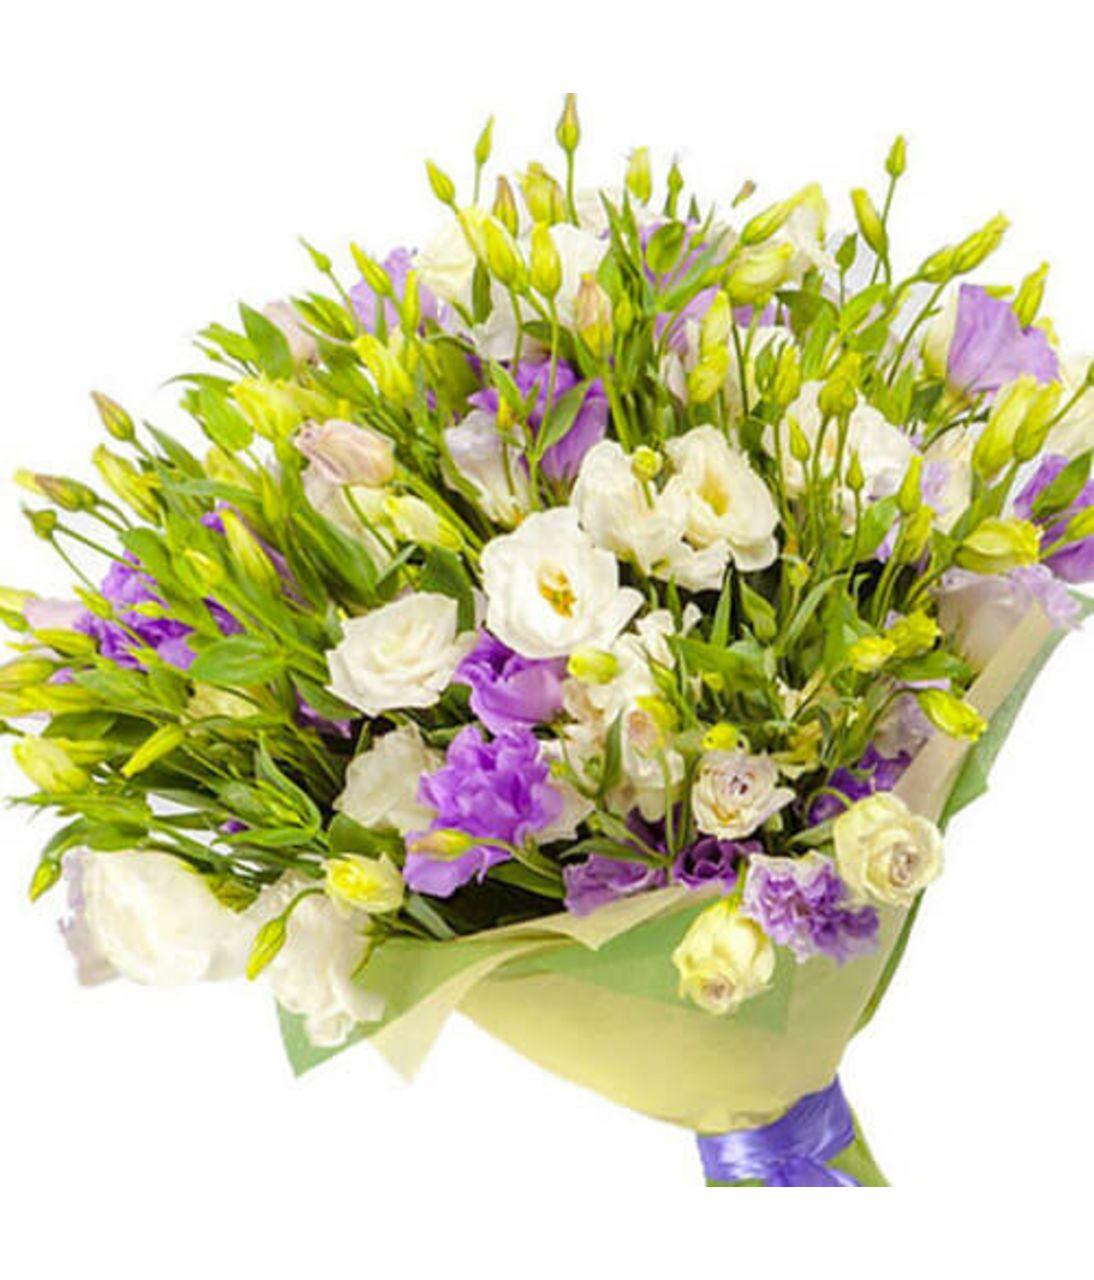 "Букет квітів з еустоми ""17 миттєвостей весни"". Superflowers.com.ua"